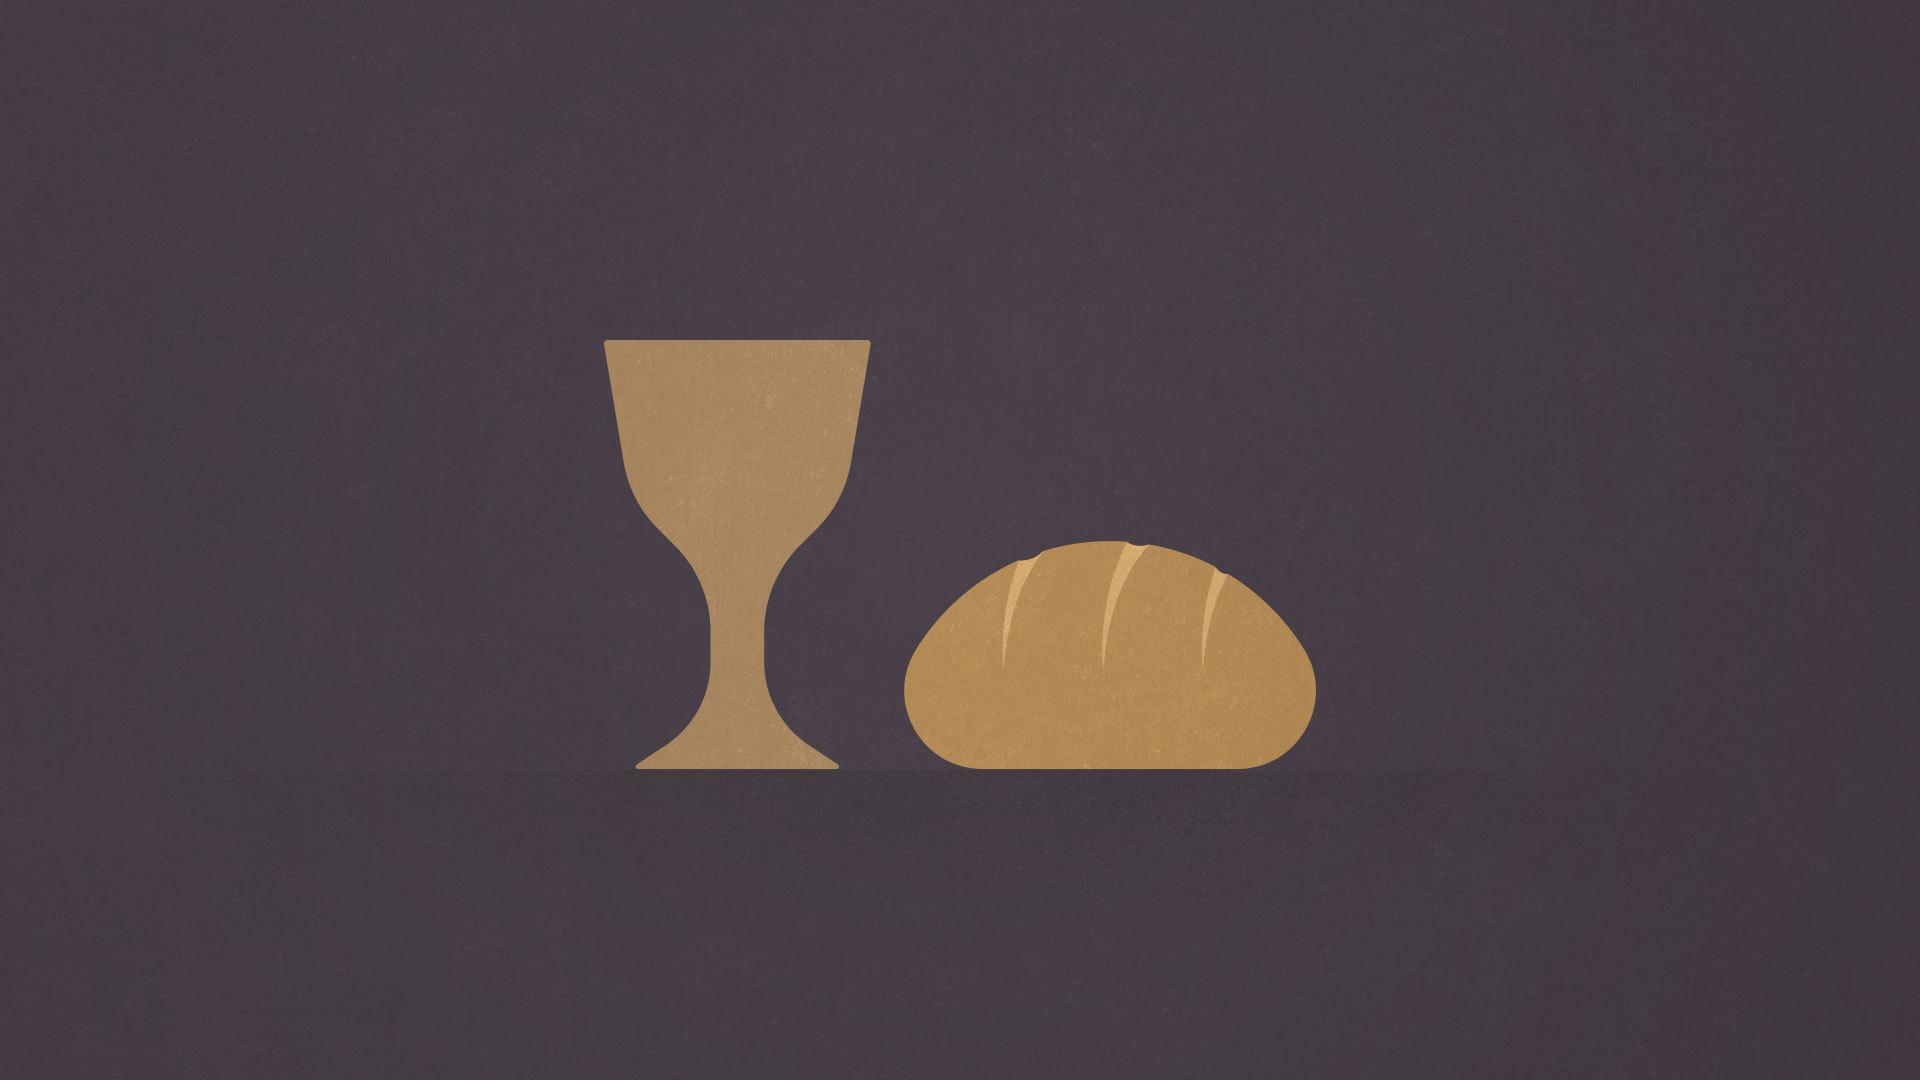 https://www.ligonier.org/blog/what-lords-supper/